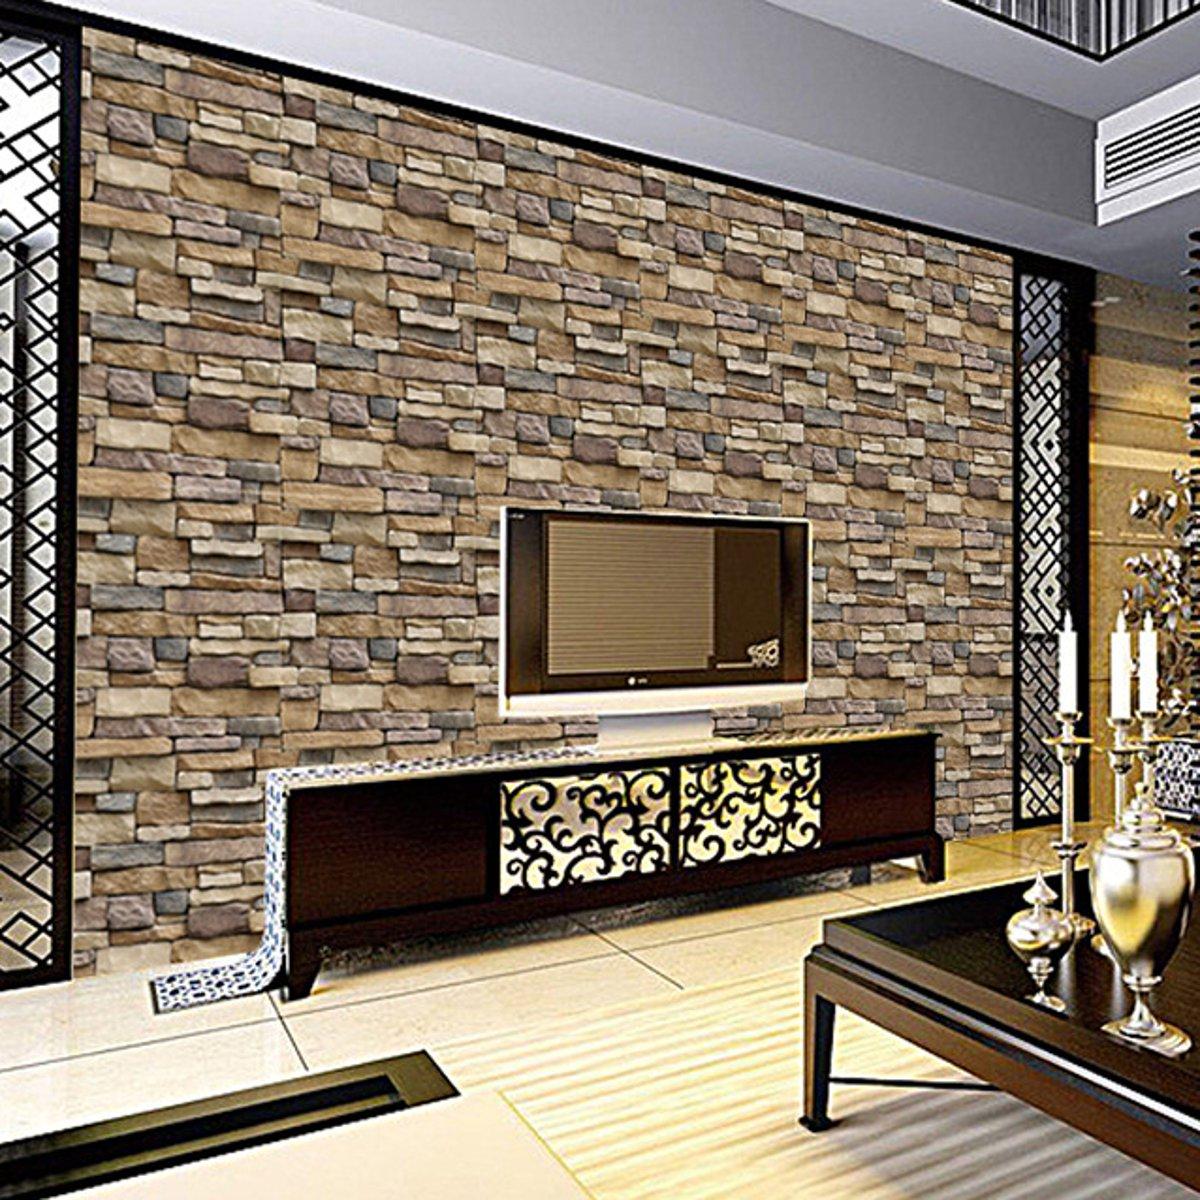 3D Luxury Self Adhesive Brick Wallpaper 10M Wall Sticker Roll Background Decals